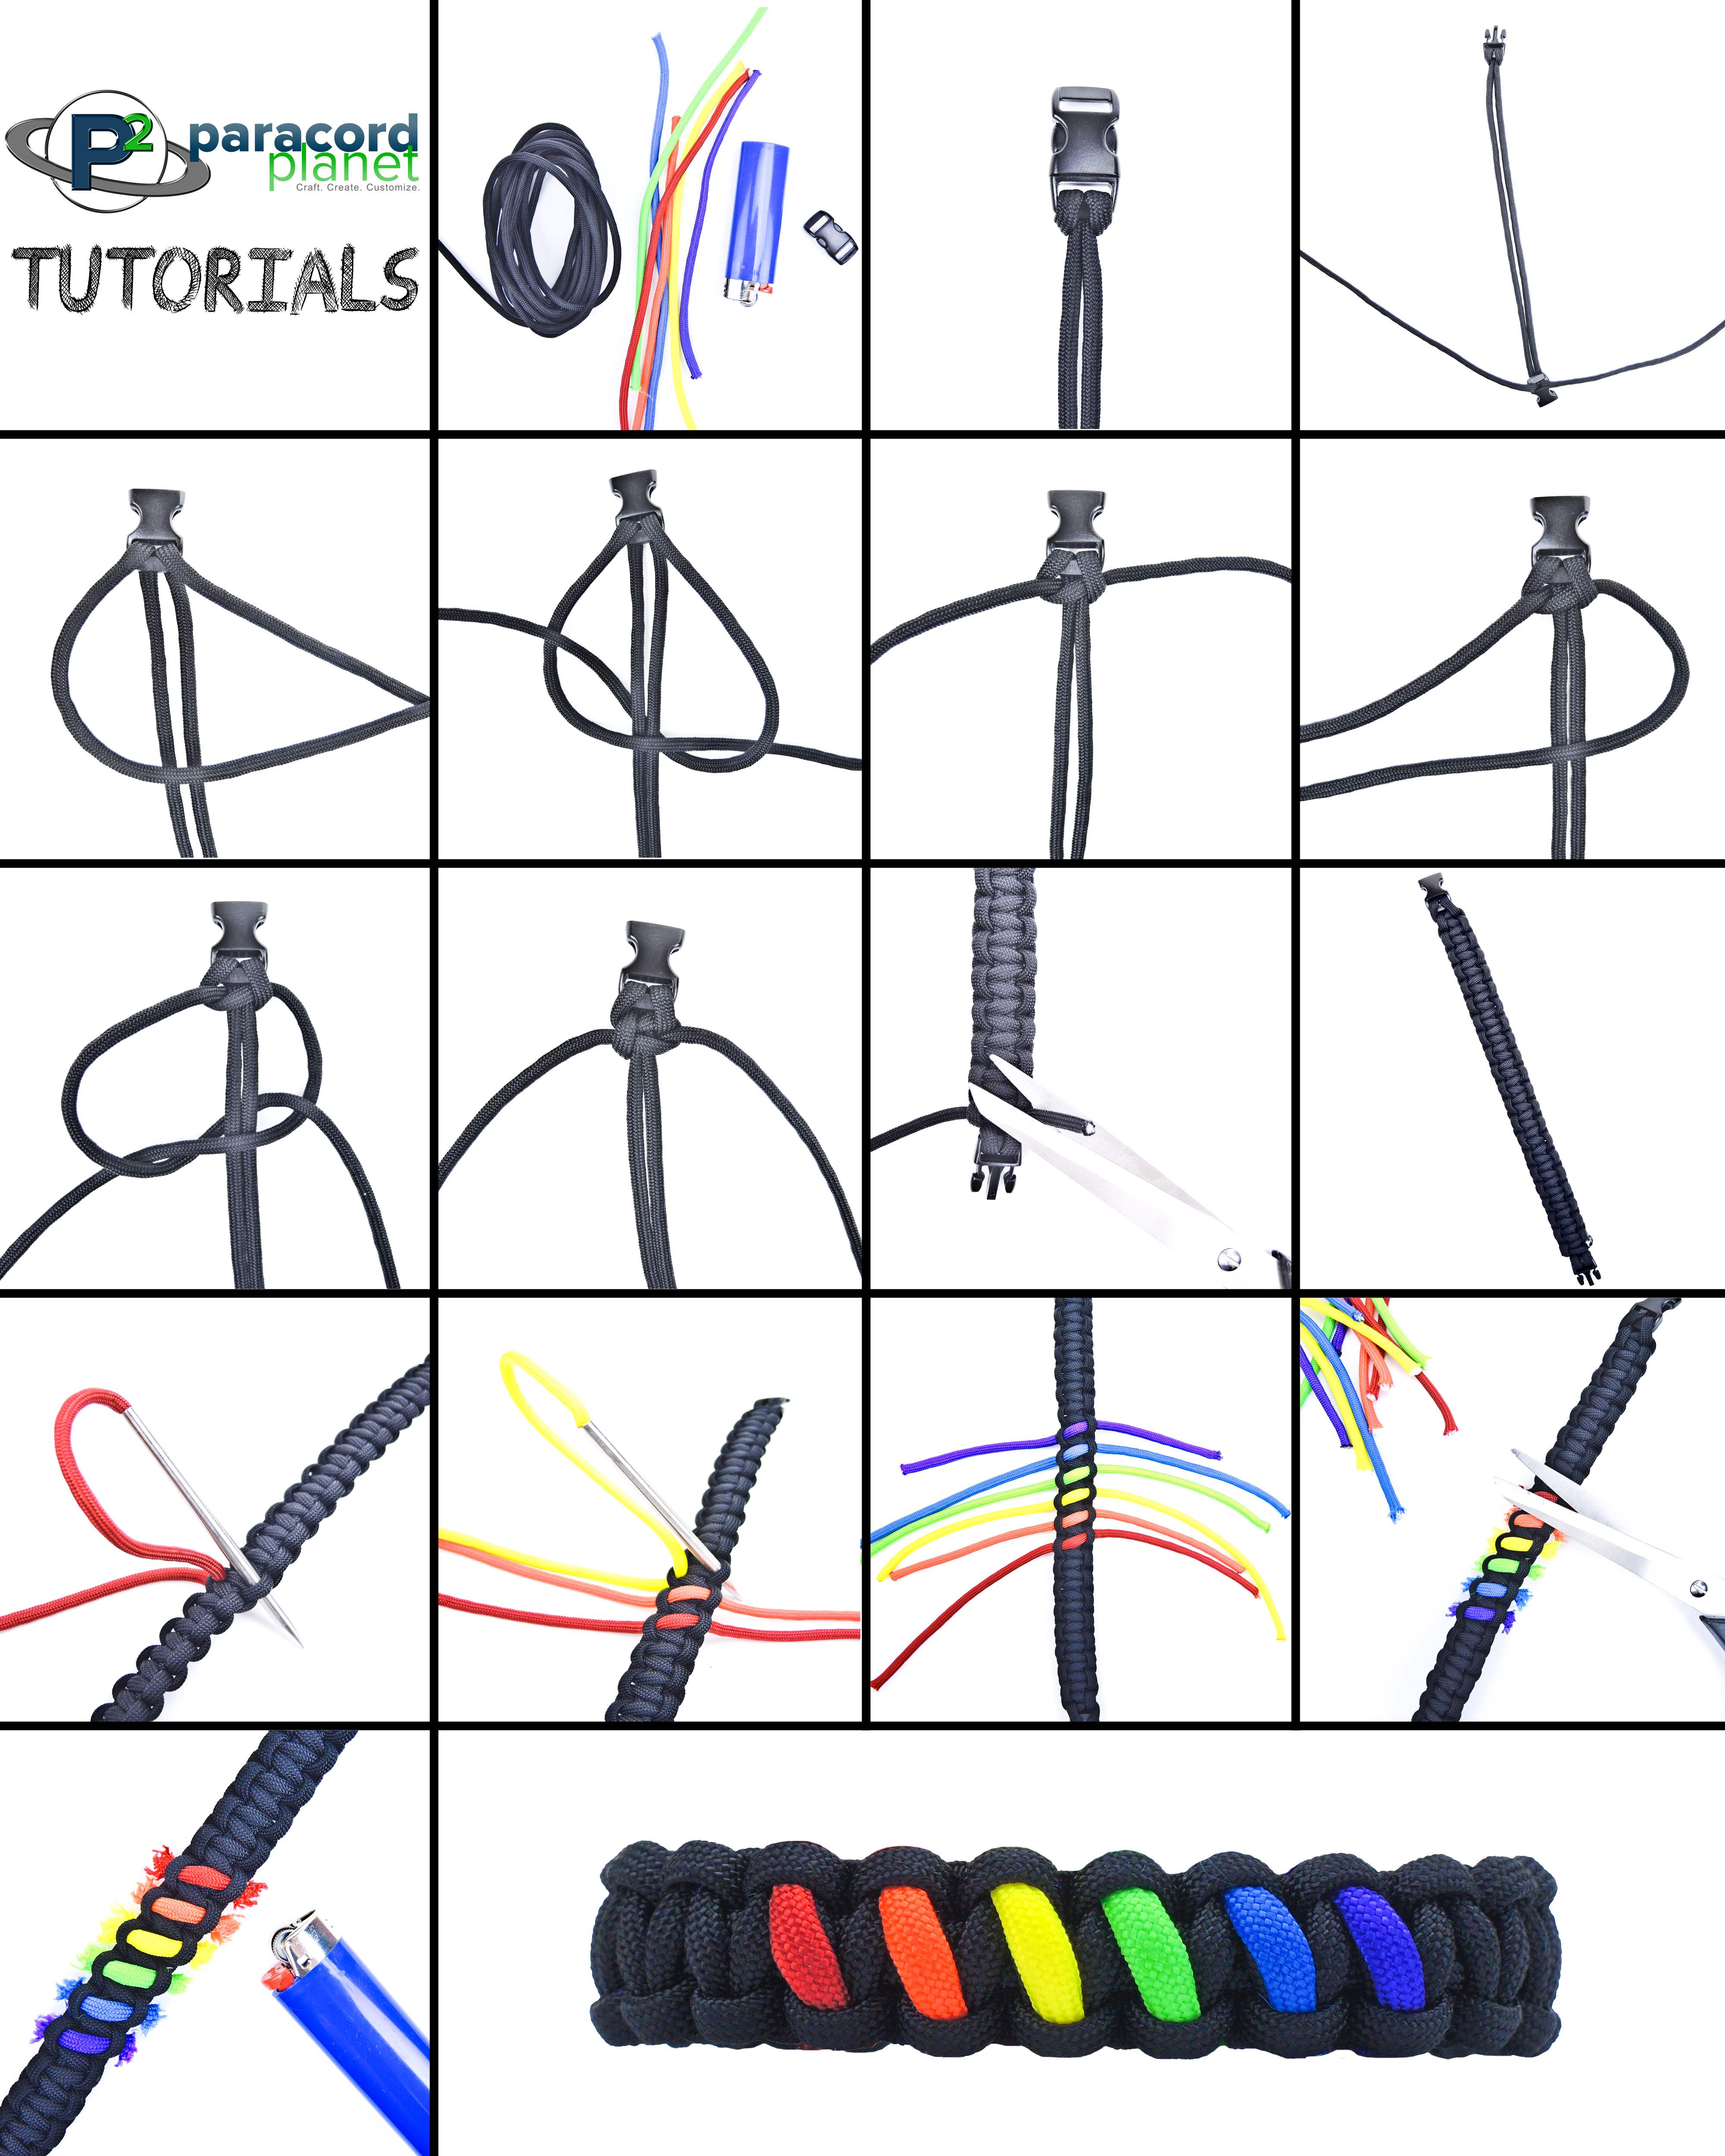 Paracord Rainbow Cobra Bracelet photo tutorial